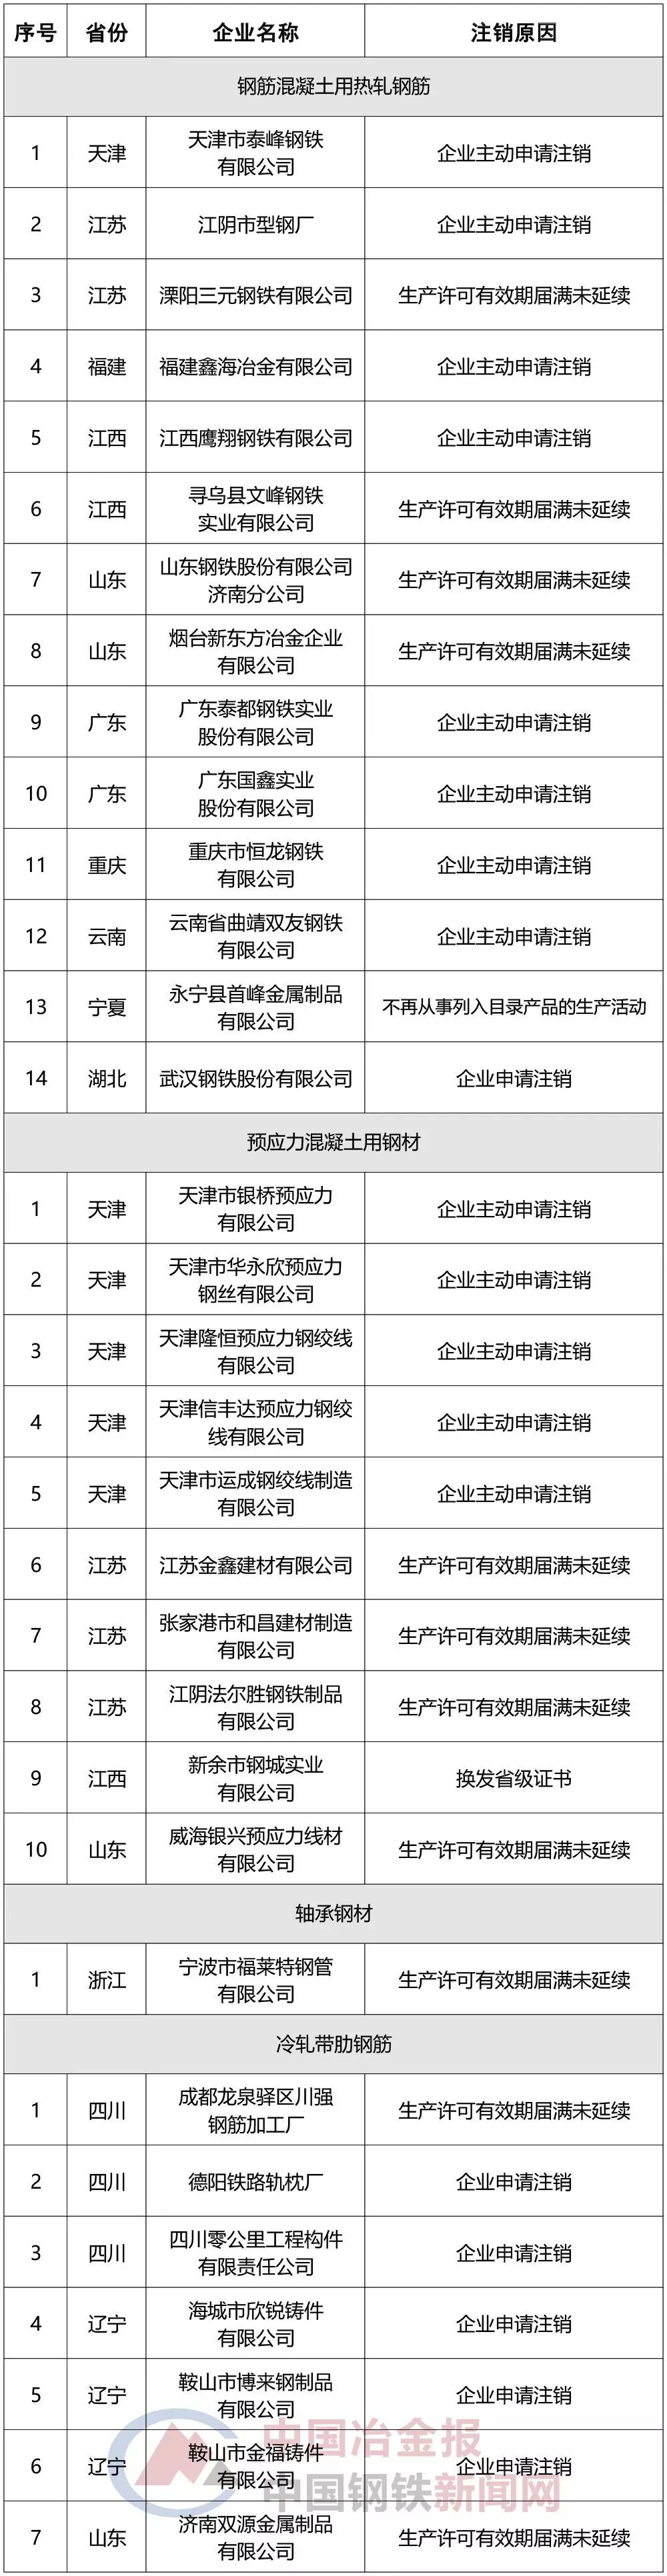 济南<a href=http://www.jnguanwan.com/cn/product/product-57-649.html target='_blank'>冷板</a>,济南方矩形管,济南<a href=http://www.jnguanwan.com/cn/product/product-16-97.html target='_blank'>冷卷</a>开平,济南<a href=http://www.jnguanwan.com/cn/product/product-16-97.html target='_blank'>冷卷</a>钢材